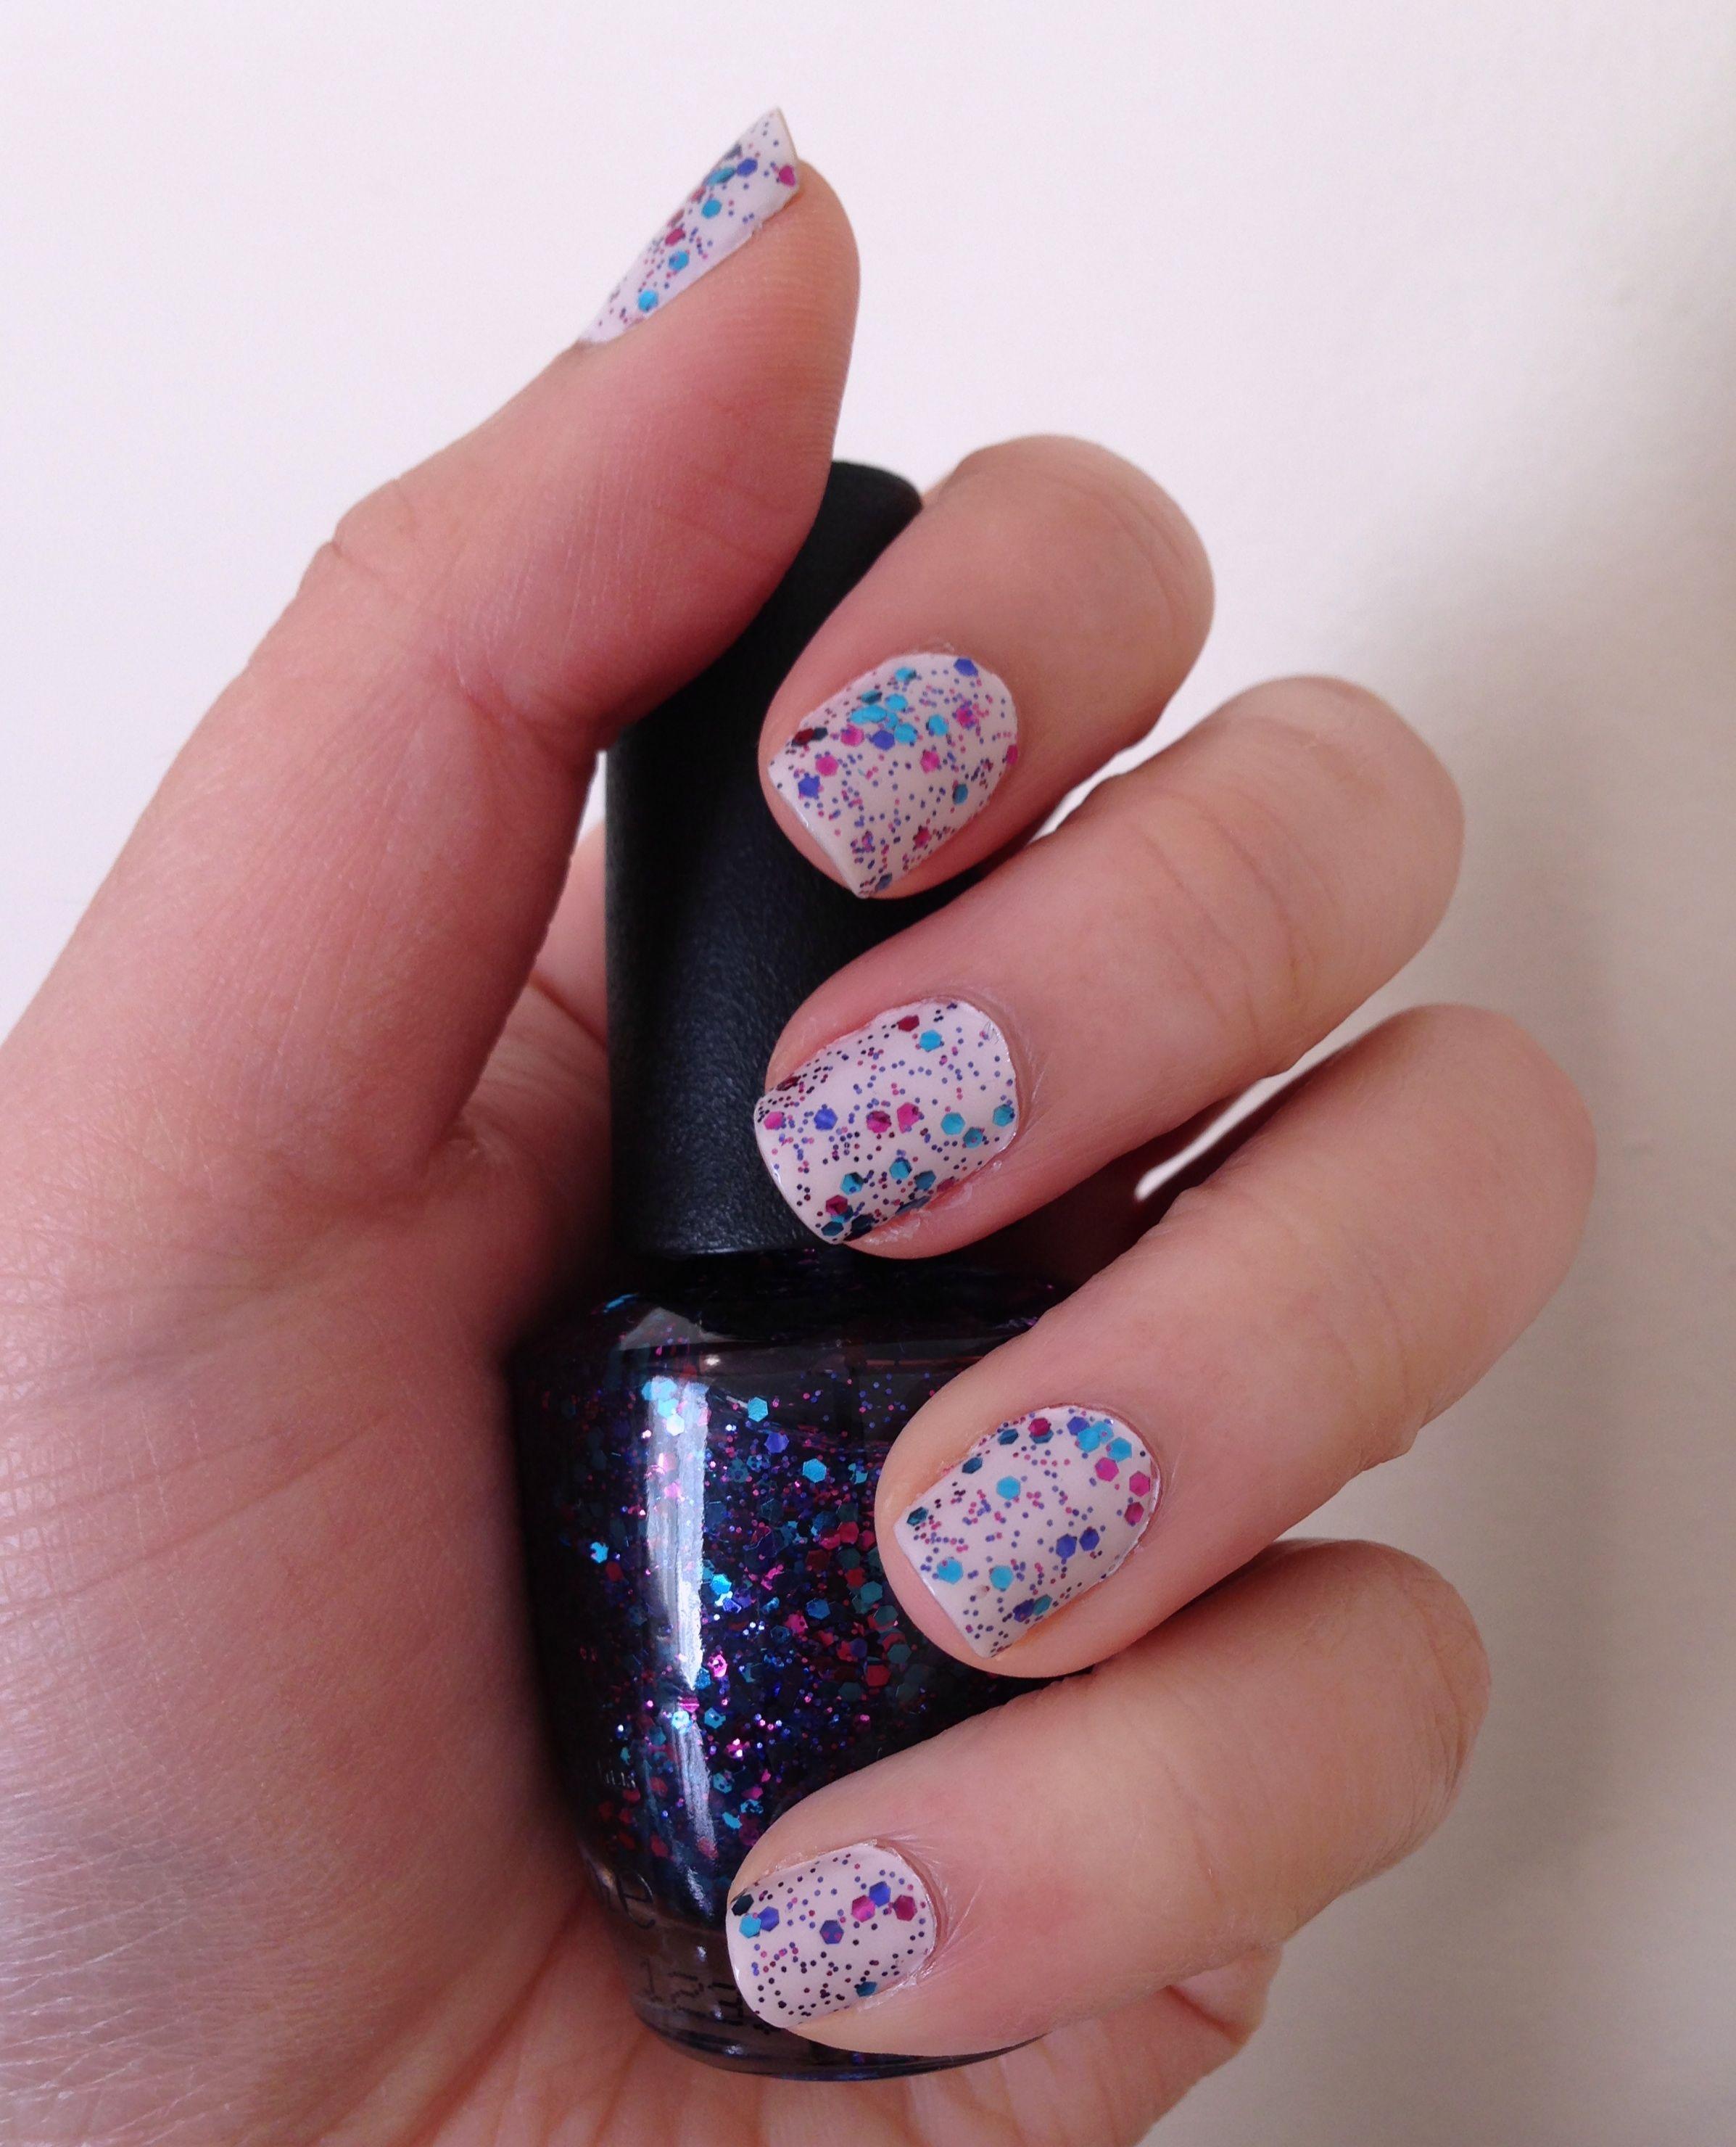 white nail polish with opi polka glitter top coat | nails